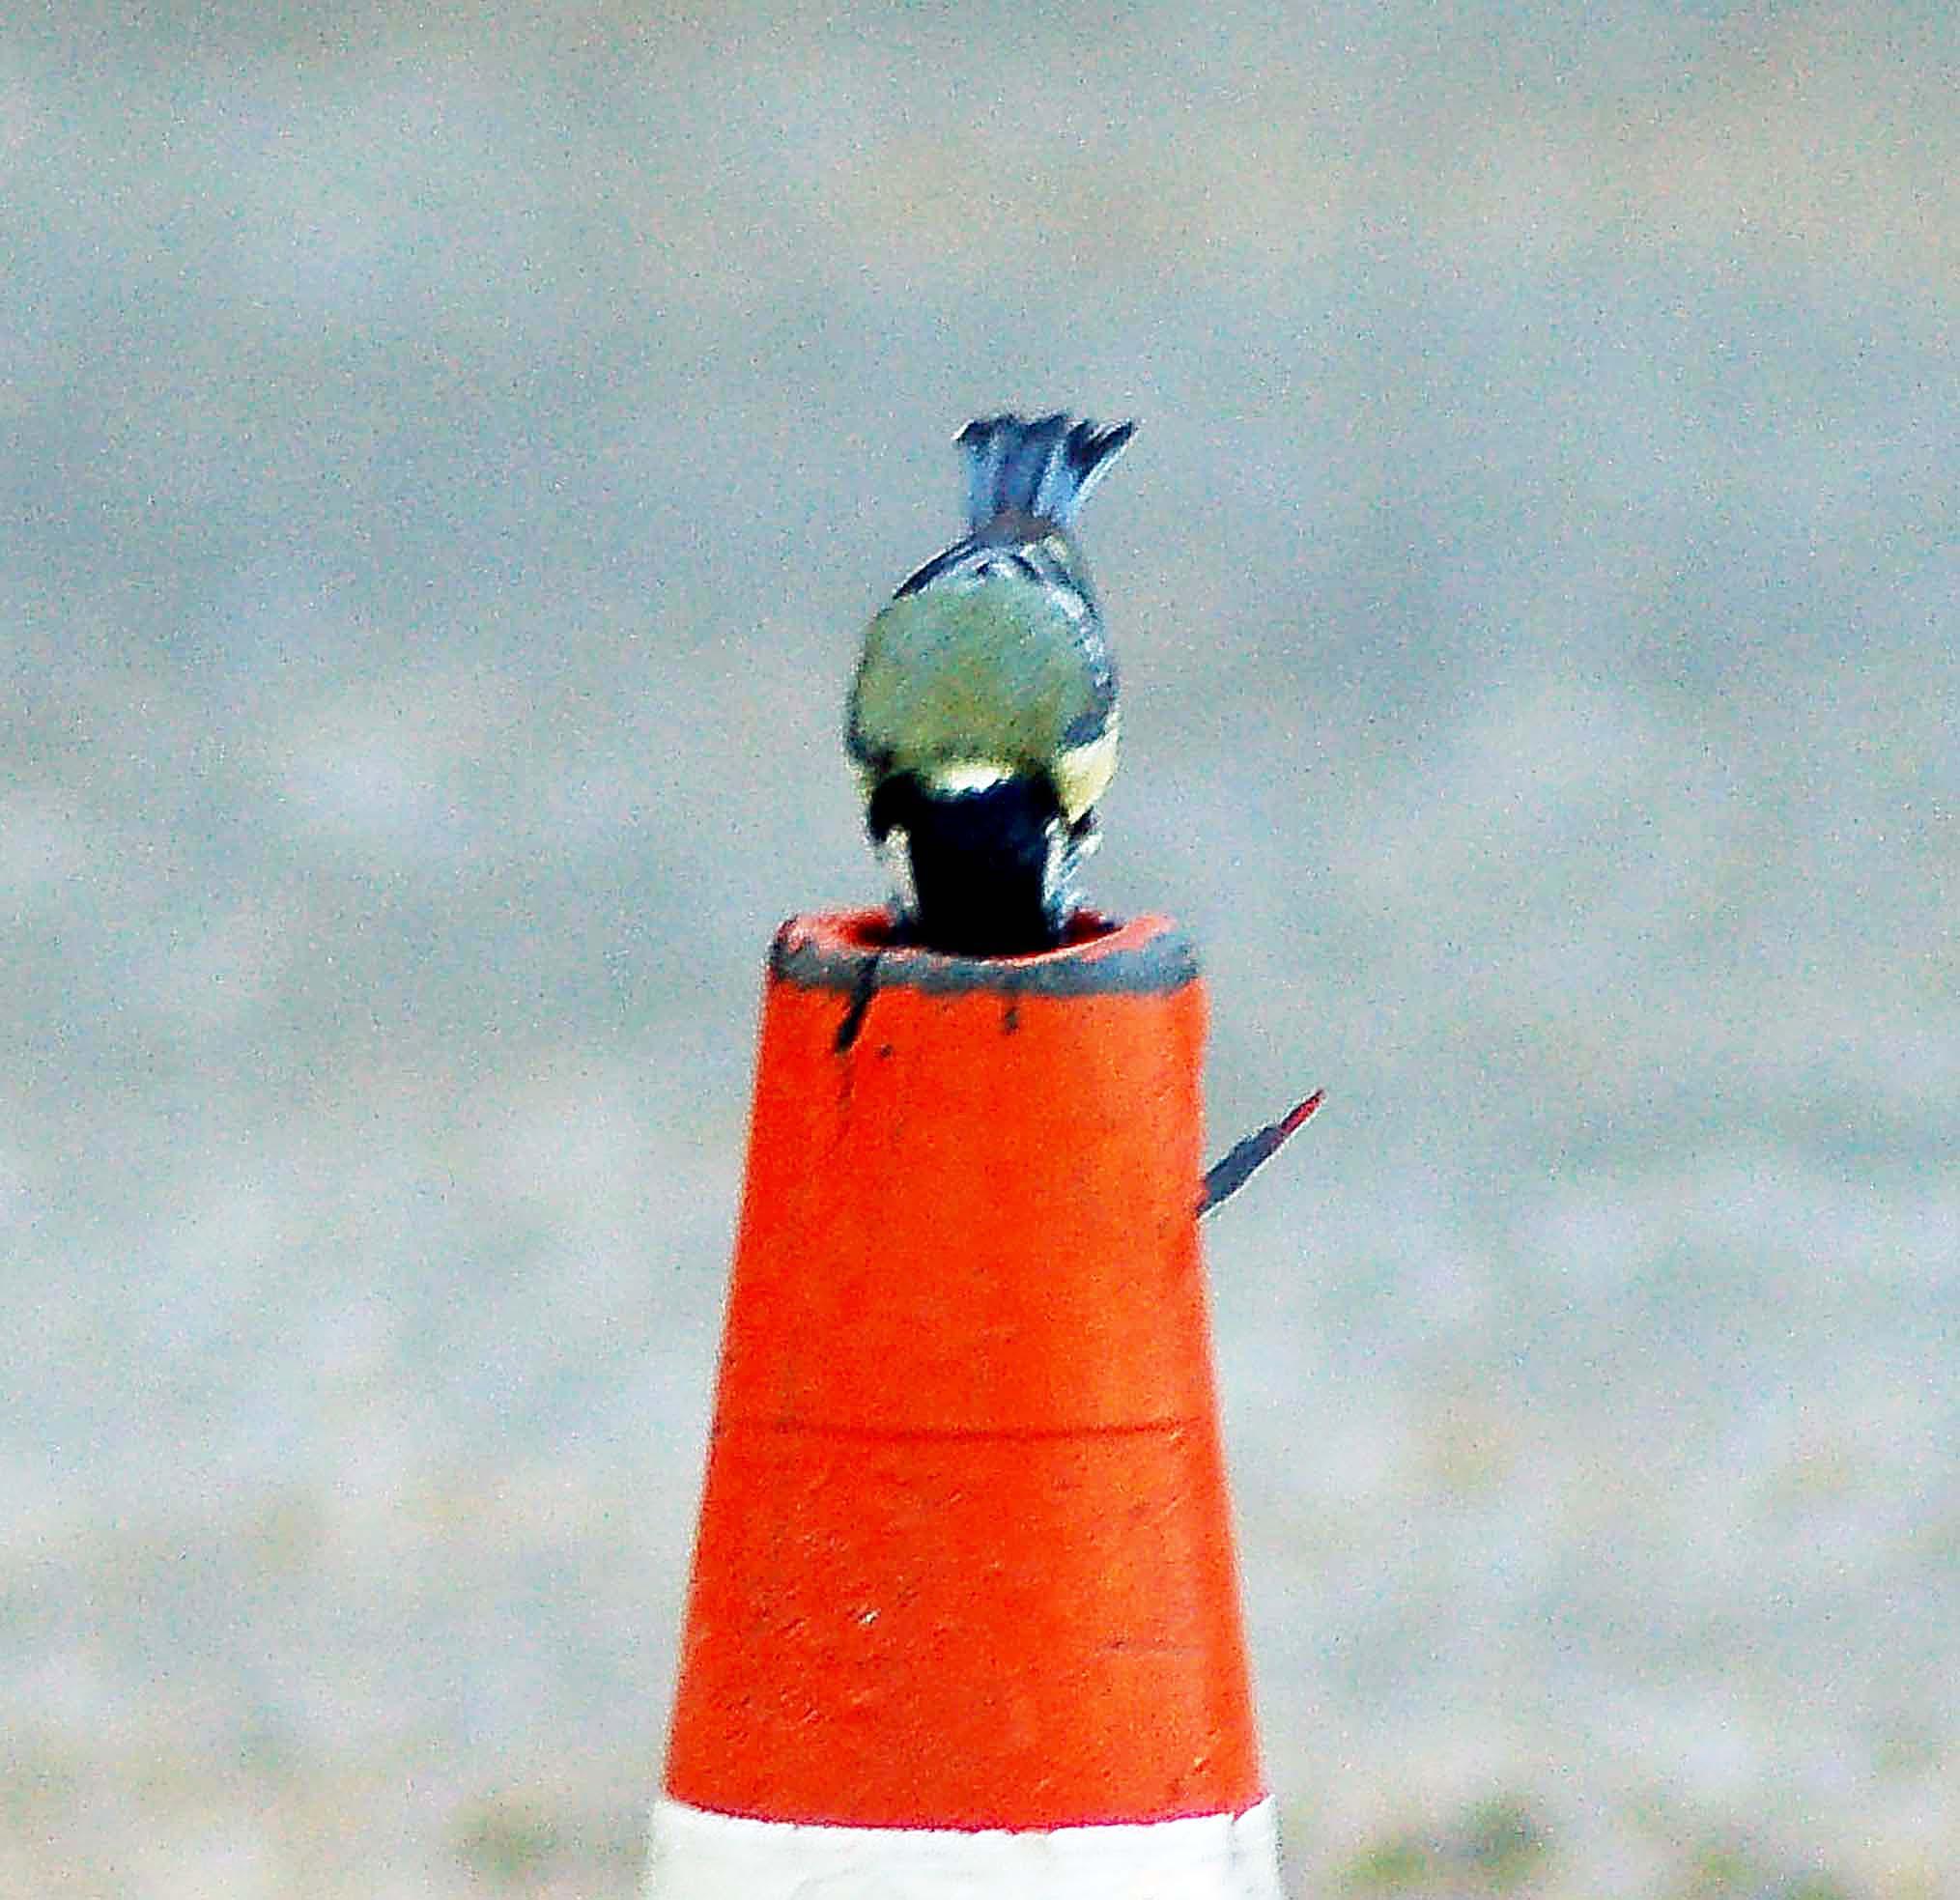 Birds make home in a traffic cone